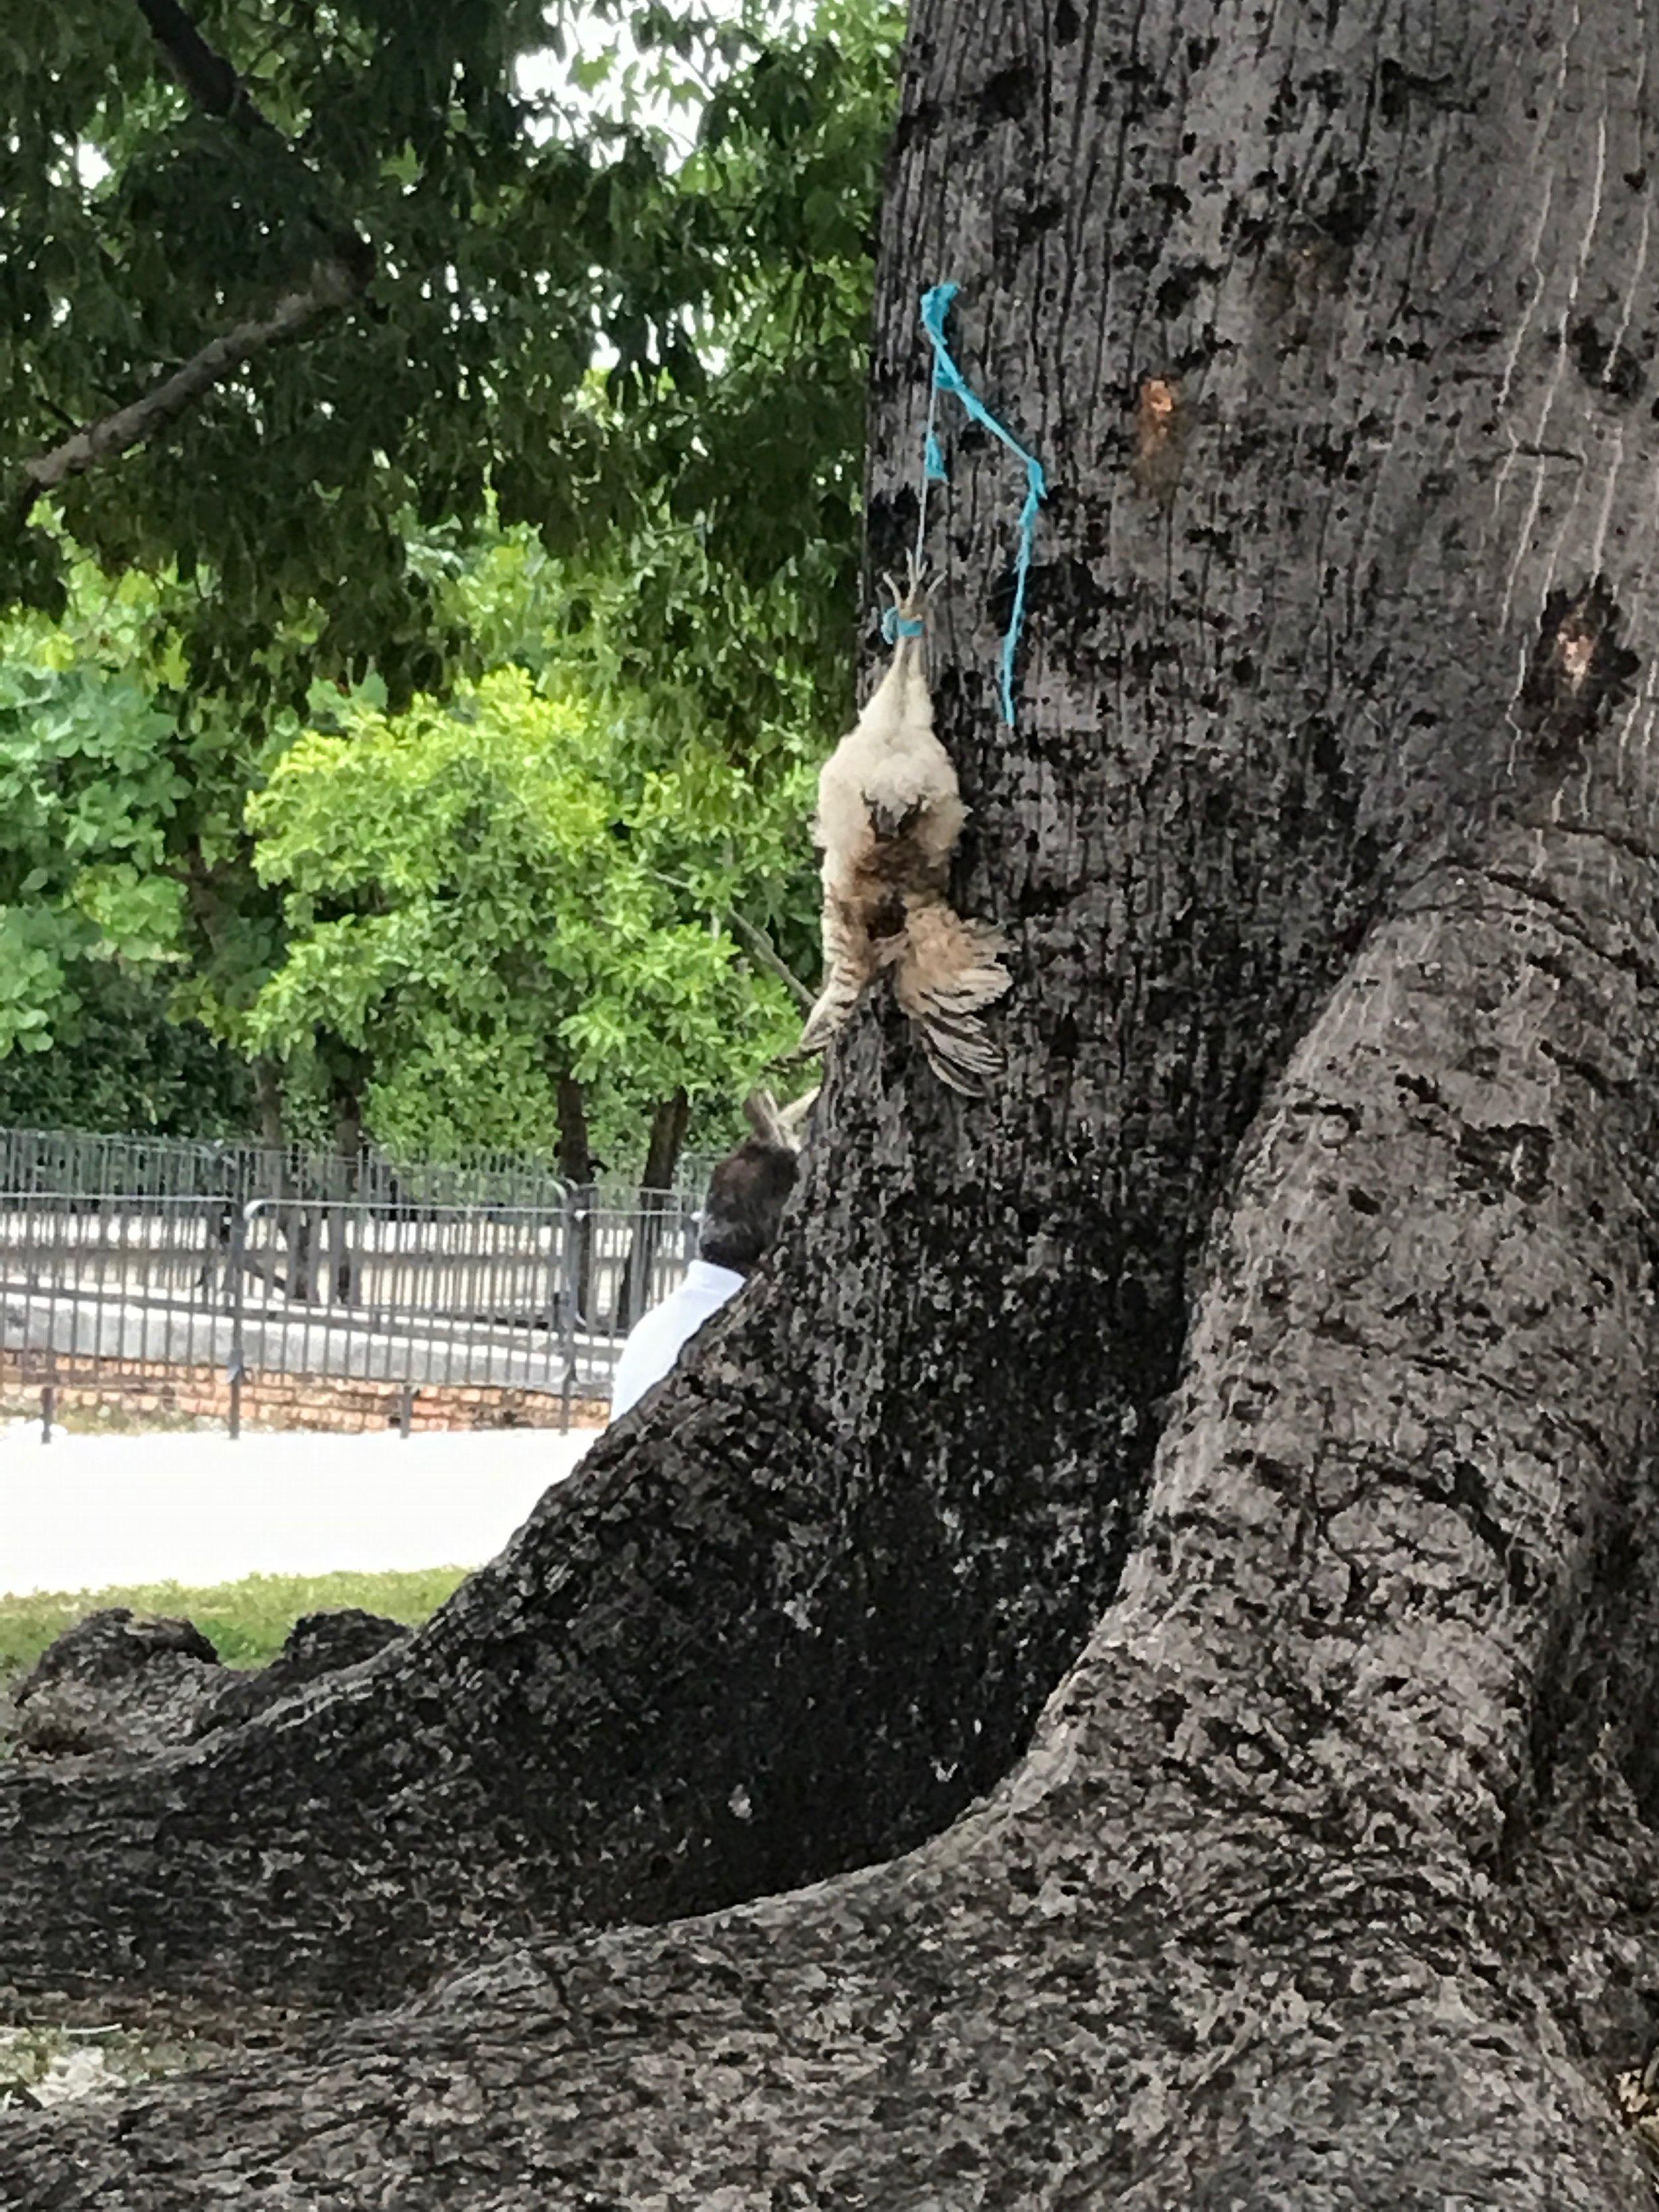 We saw evidence of Santería being practiced around Havana like this chicken sacrifice.